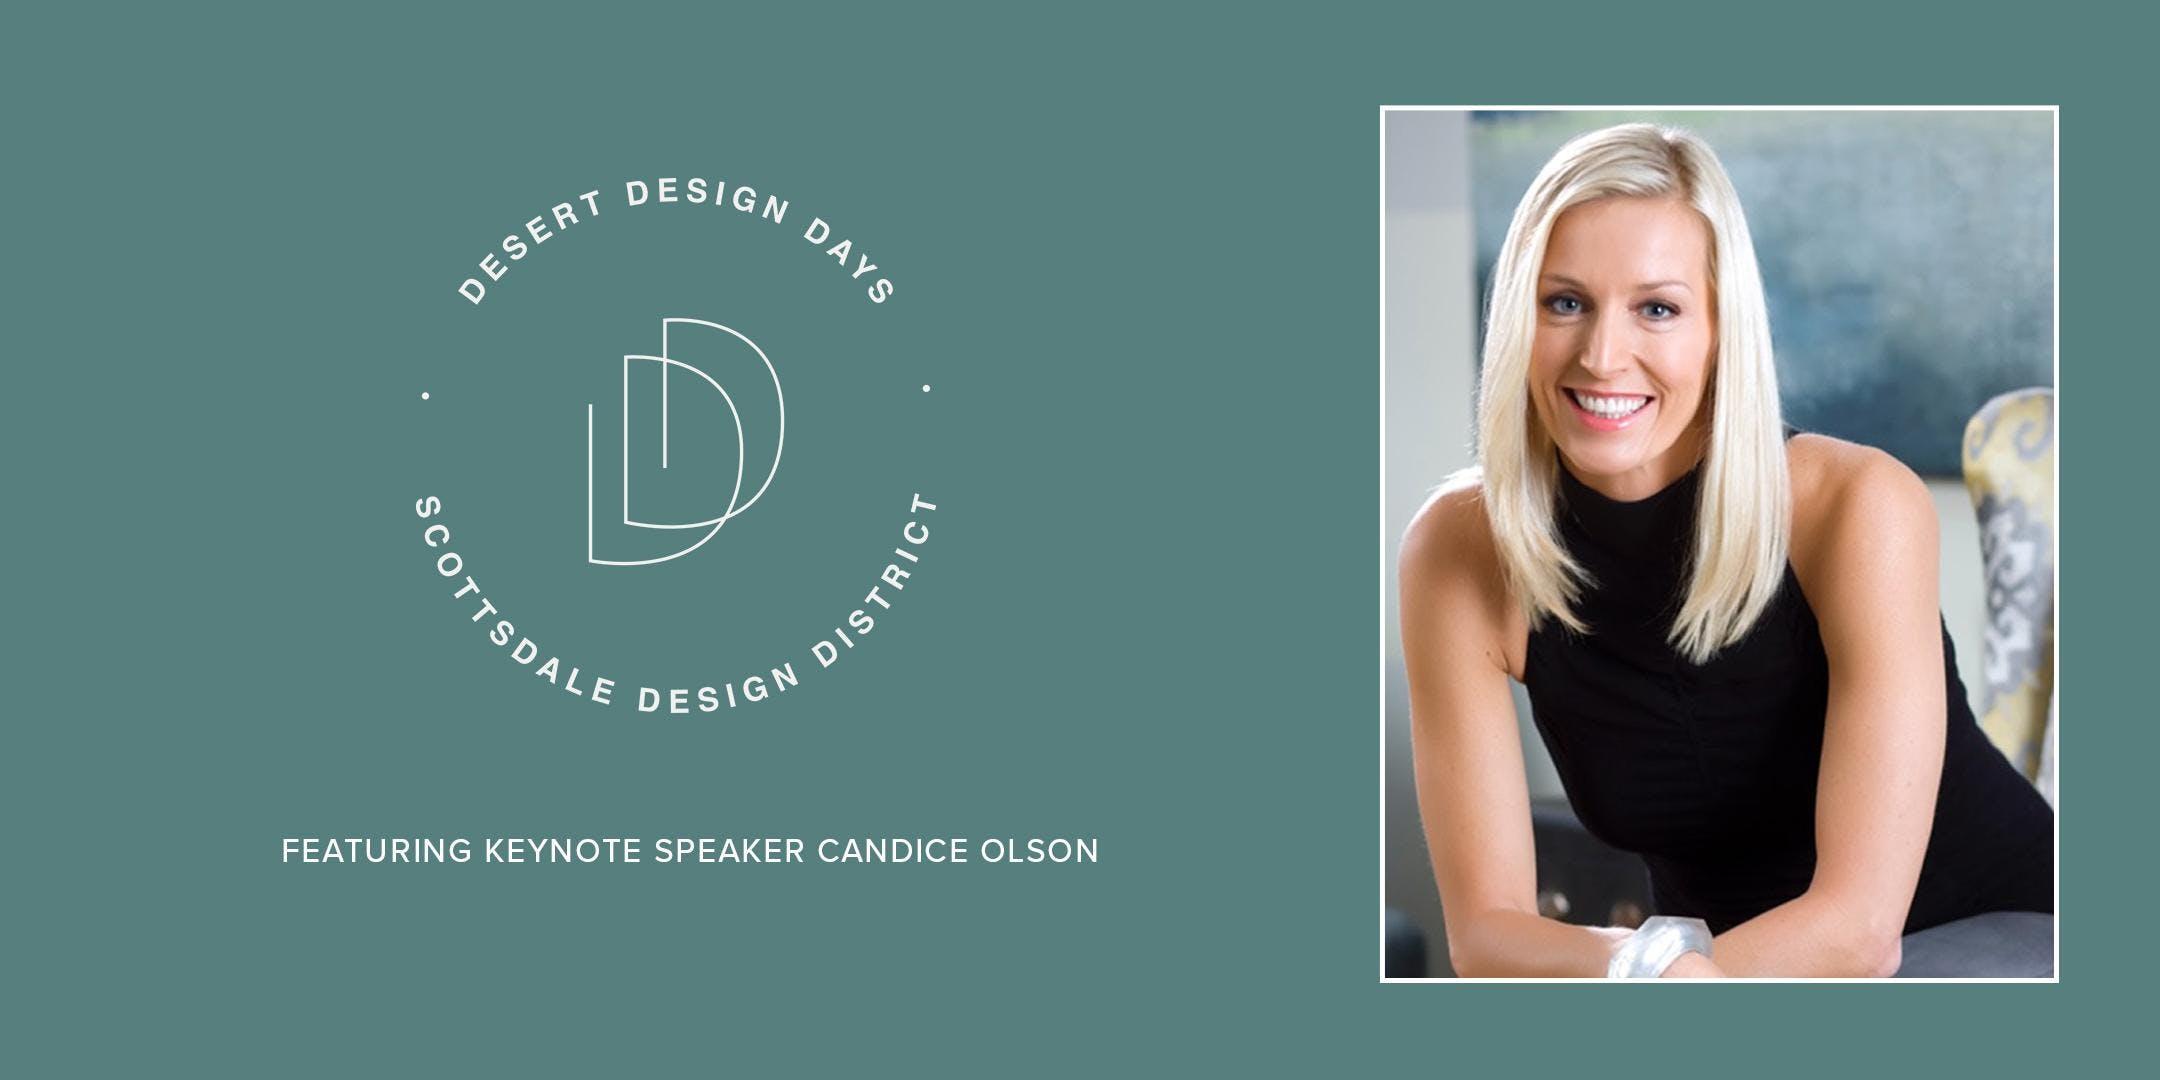 Desert Design Days: Candice Olson